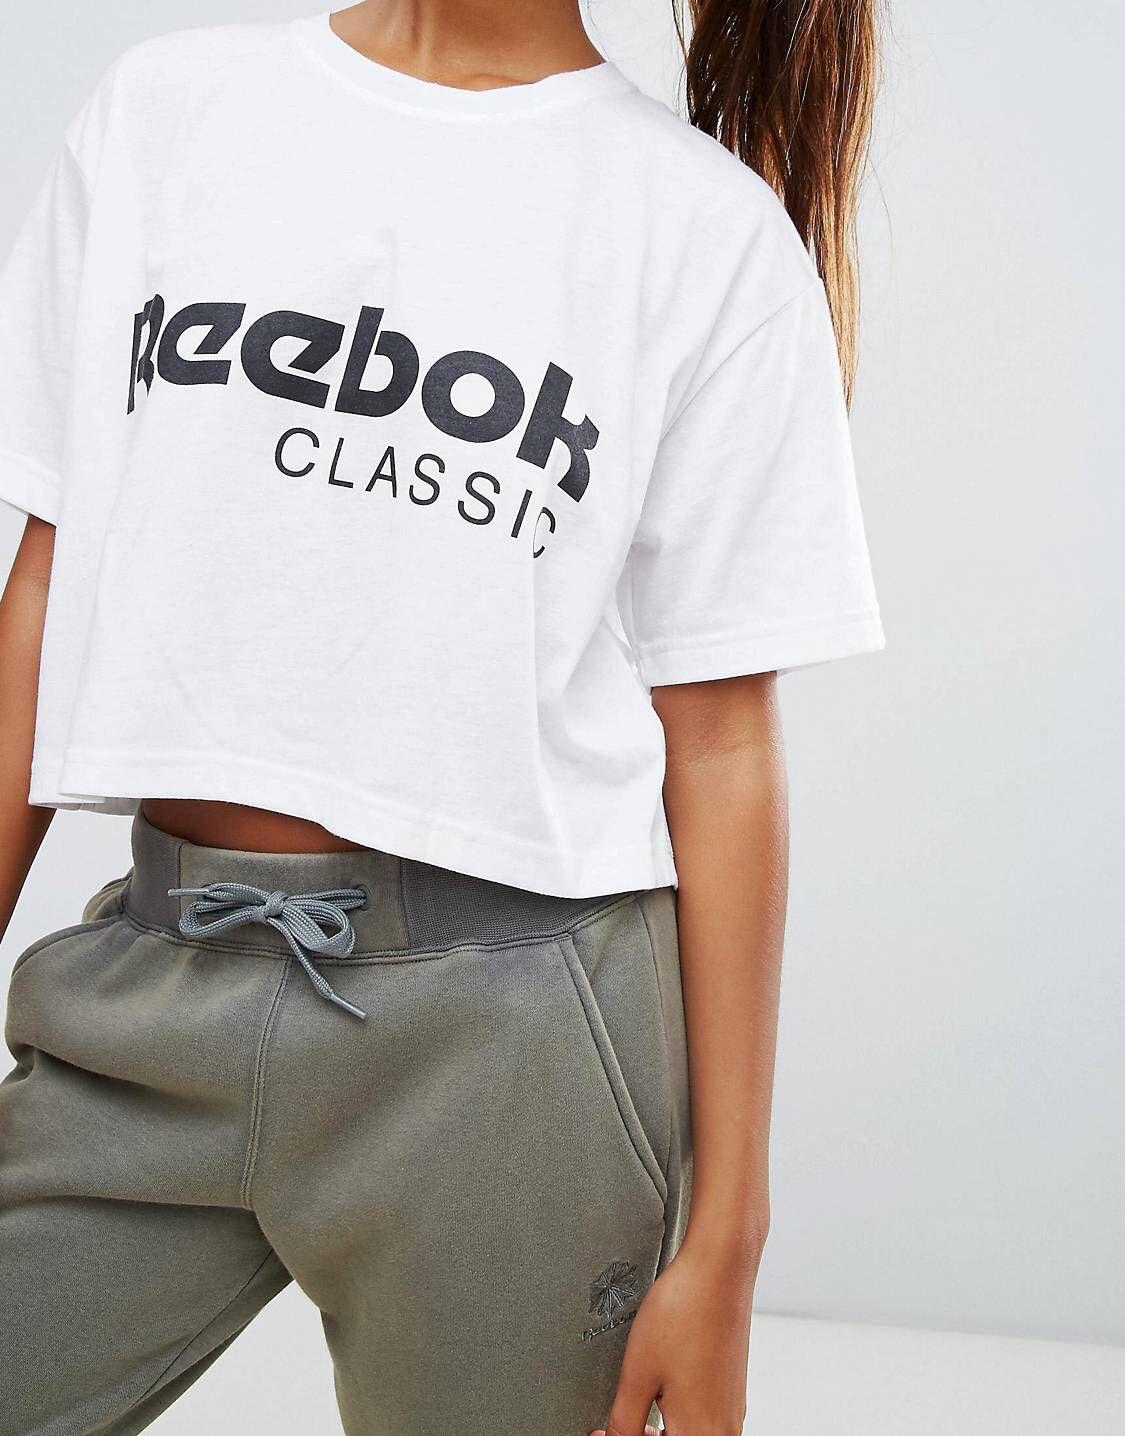 e611426a087a1 Reebok Classics Logo Cropped T-Shirt In White